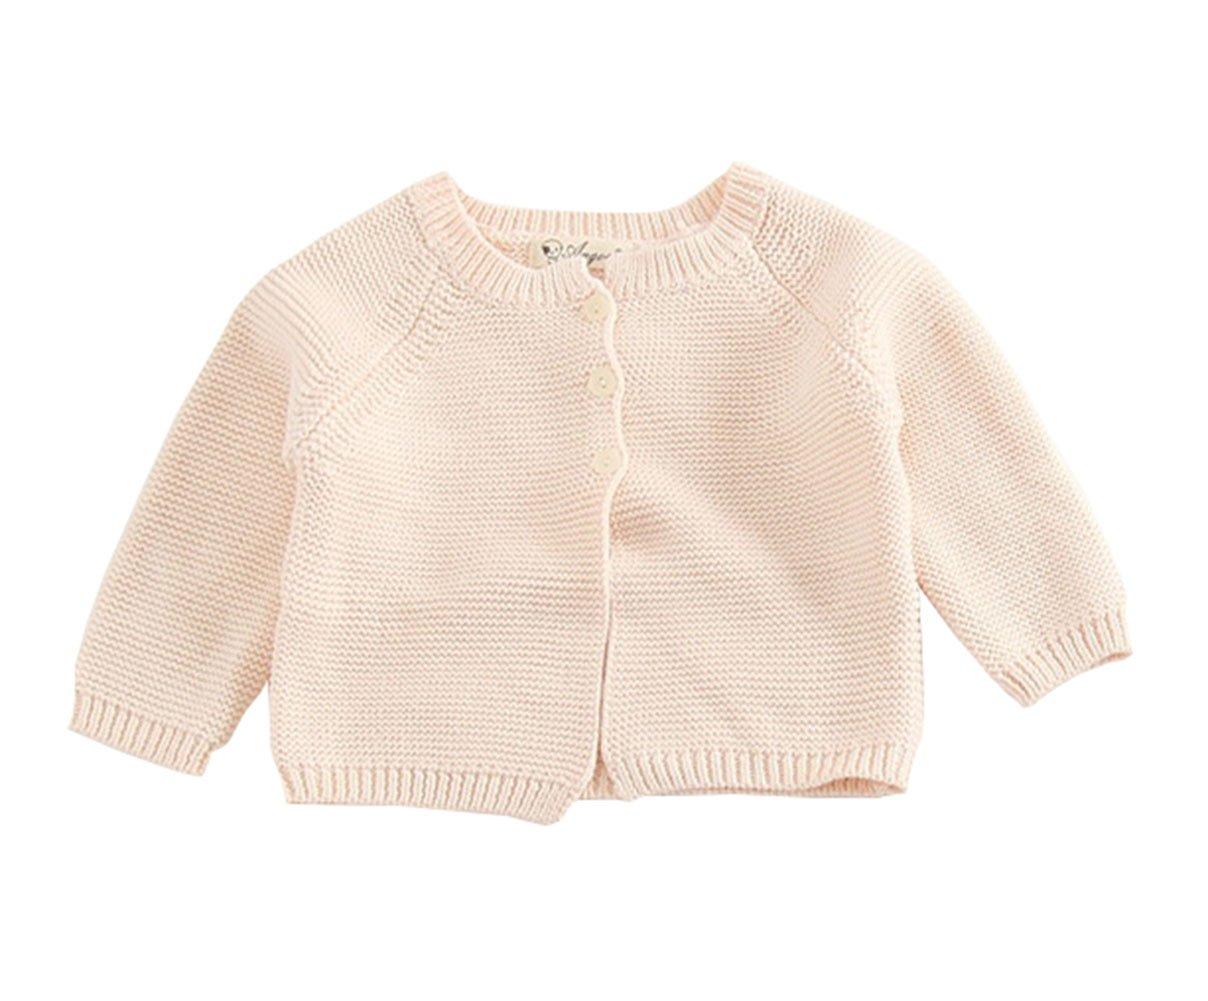 TAIYCYXGAN Baby Girls Fine Knit Cardigan Sweaters Infant Toddlers Cotton Soft Sweater Jacket Coat Shrug Beige 100